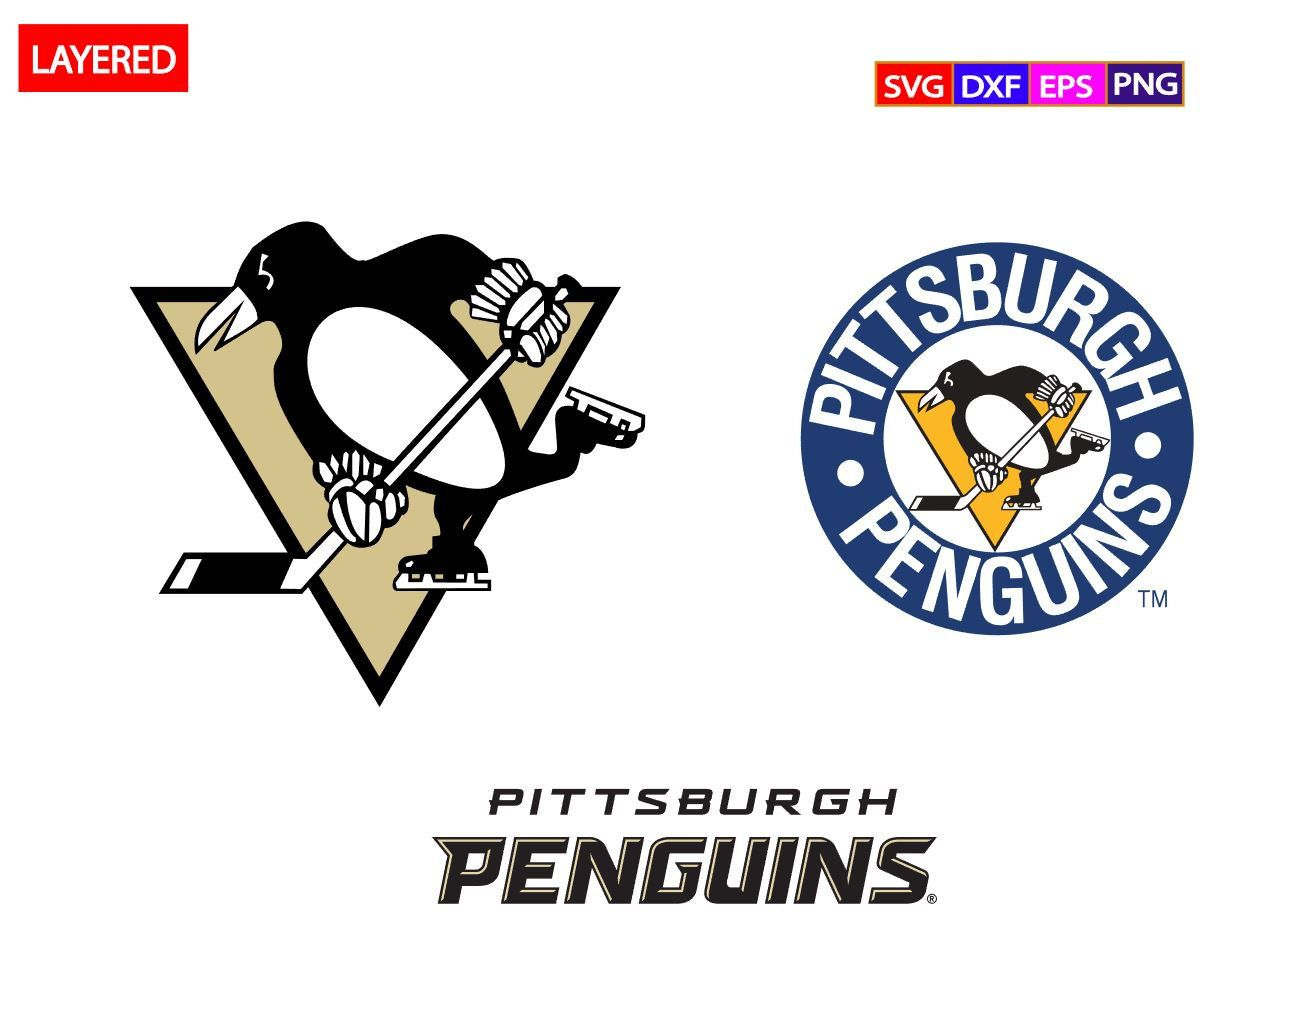 Pittsburgh Penguins Back2backchamps Pittsburgh Penguins Logo Pittsburgh Penguins Wallpaper Hockey Logos